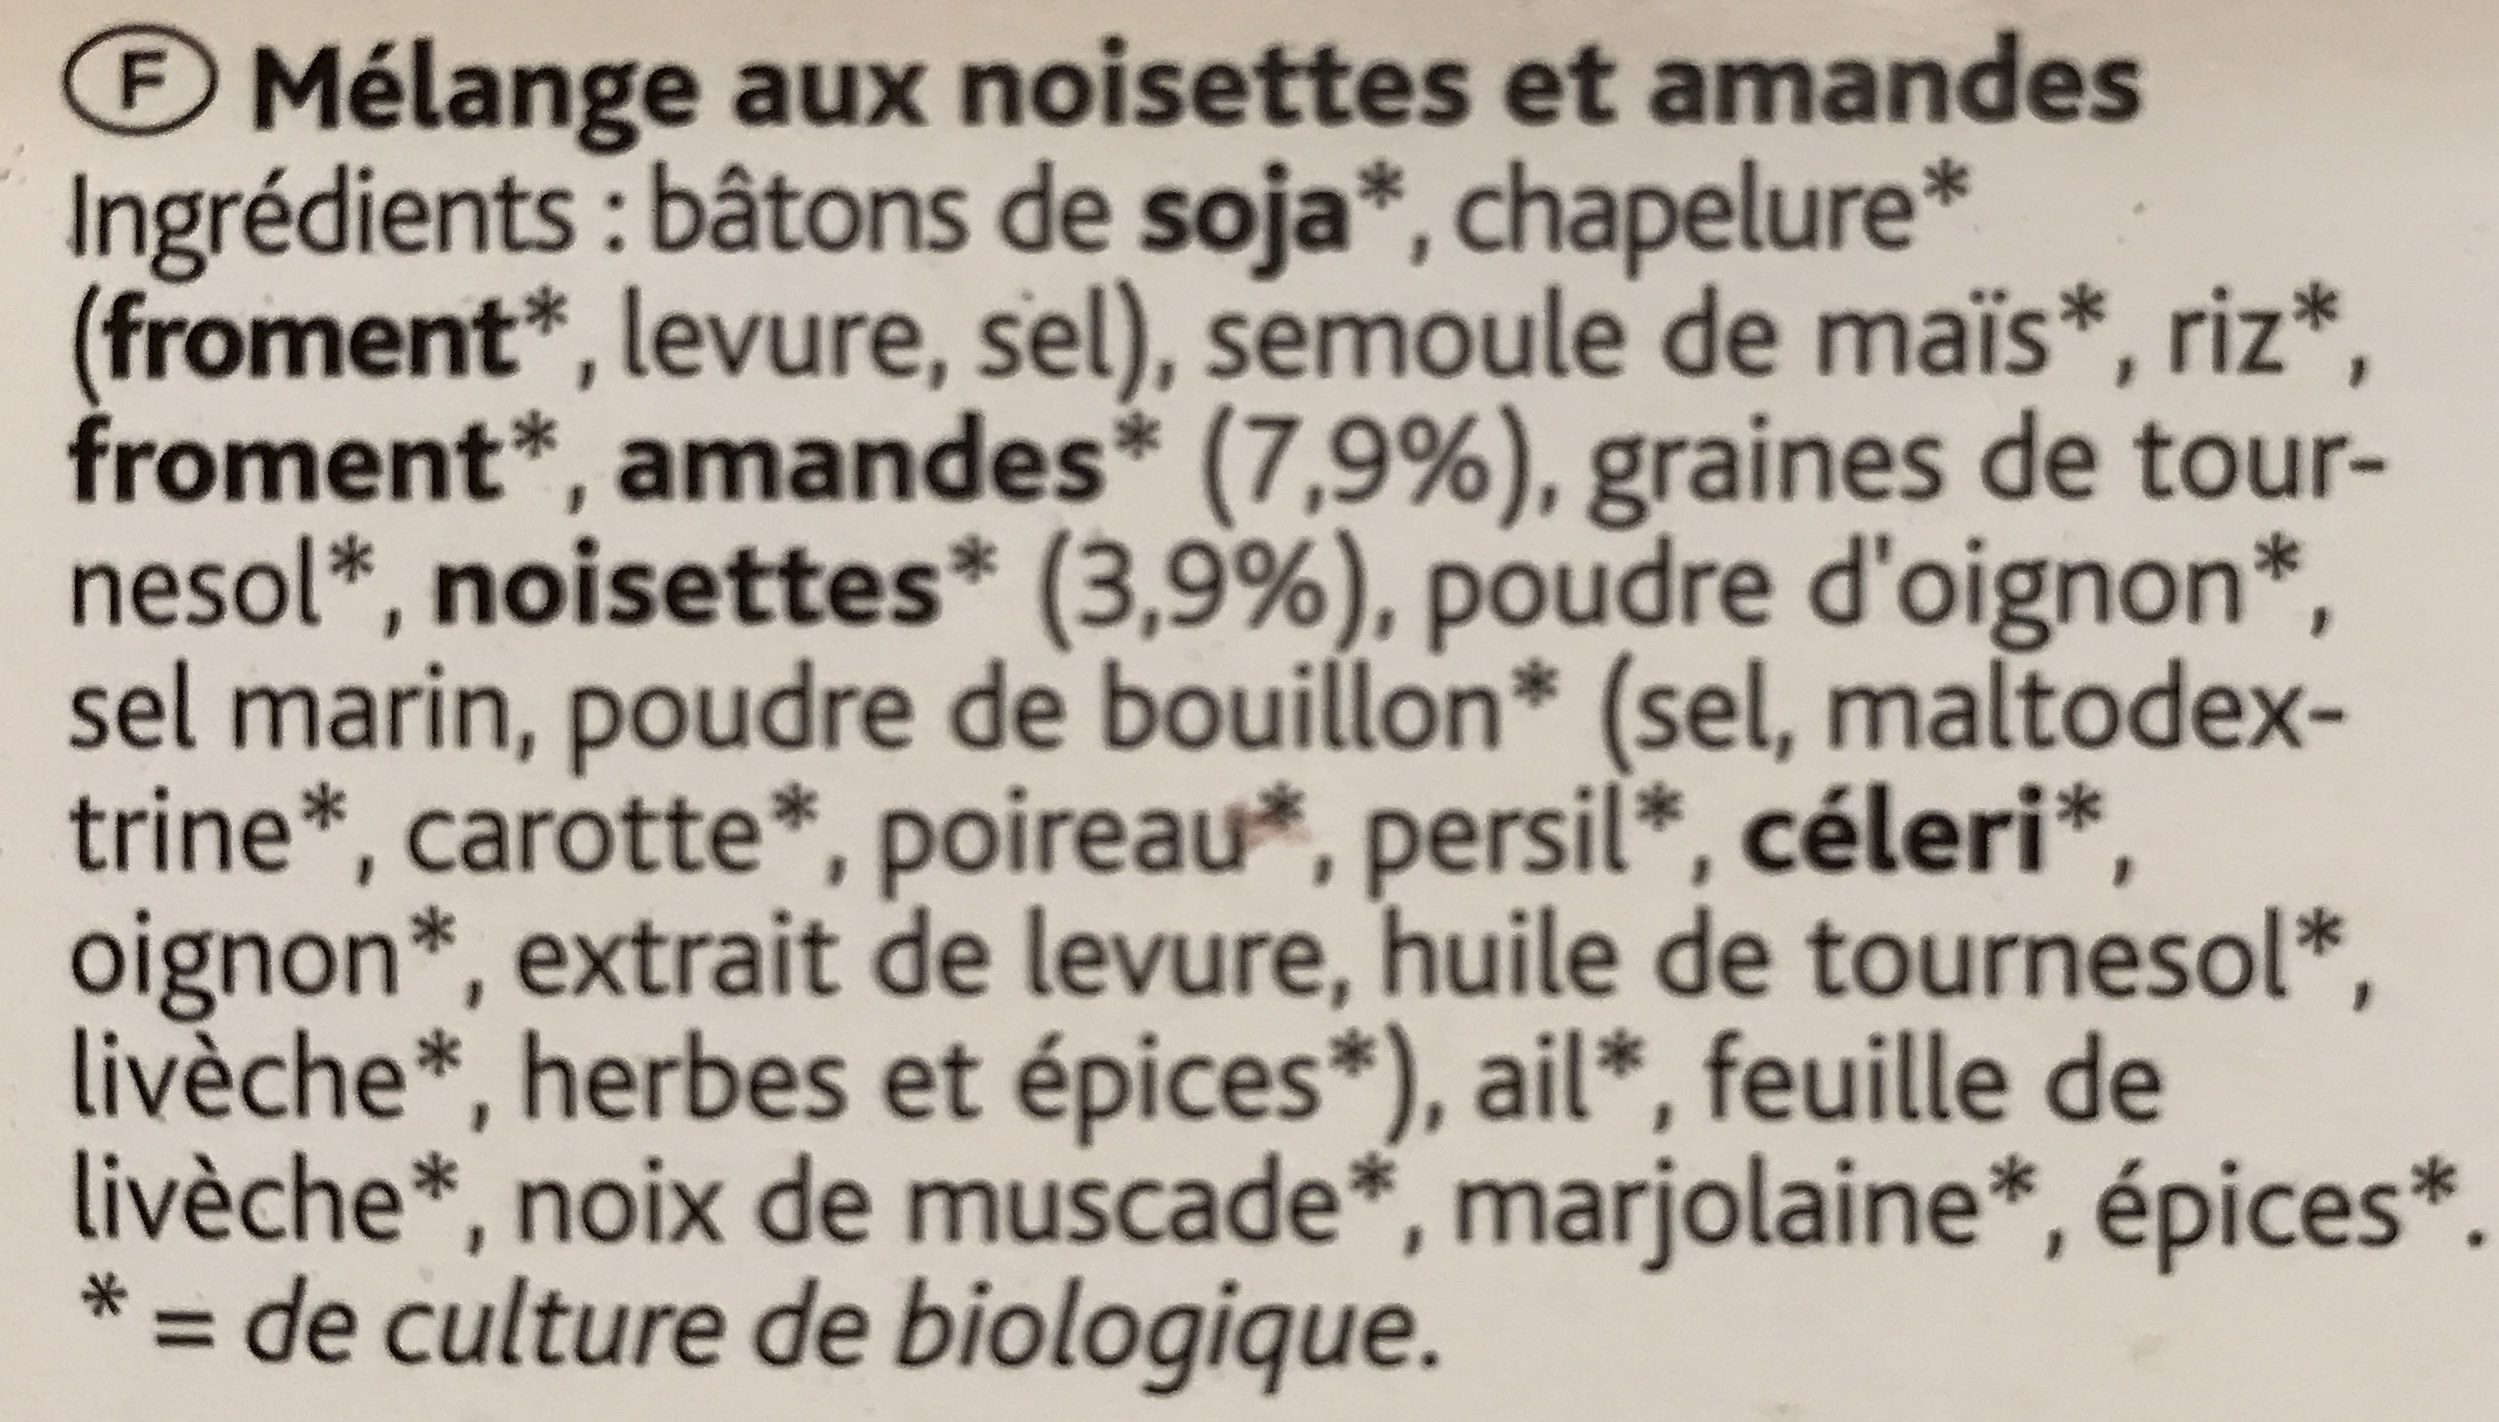 Bioburger Noisettes Amandes - Ingrediënten